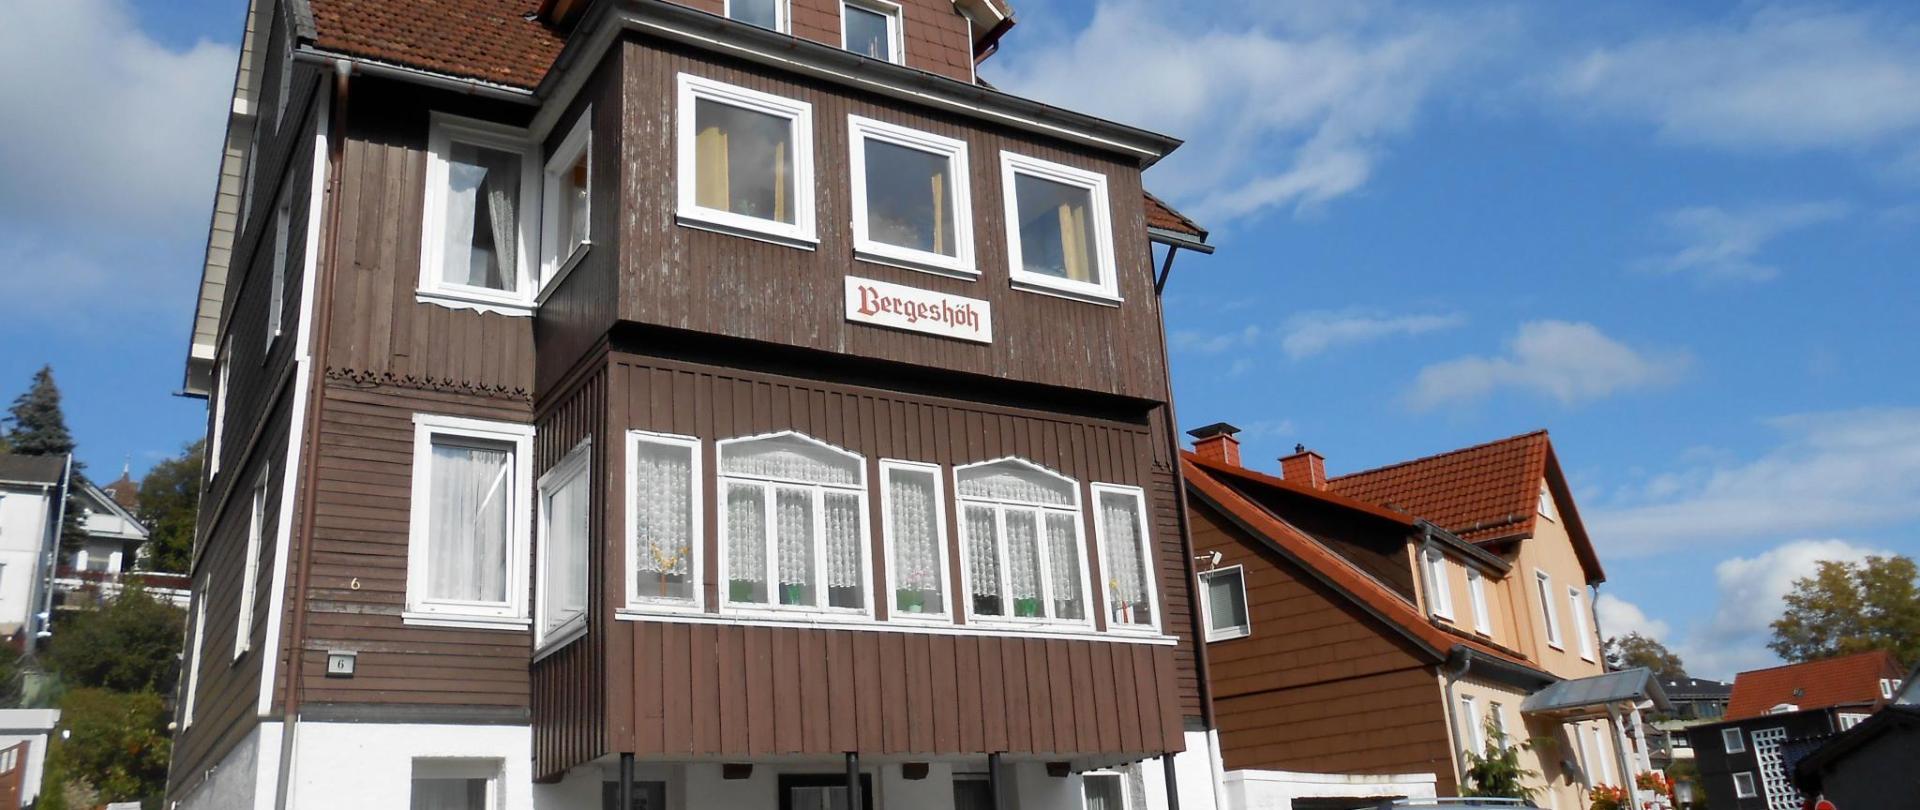 Fassade Titelbild 5.jpg